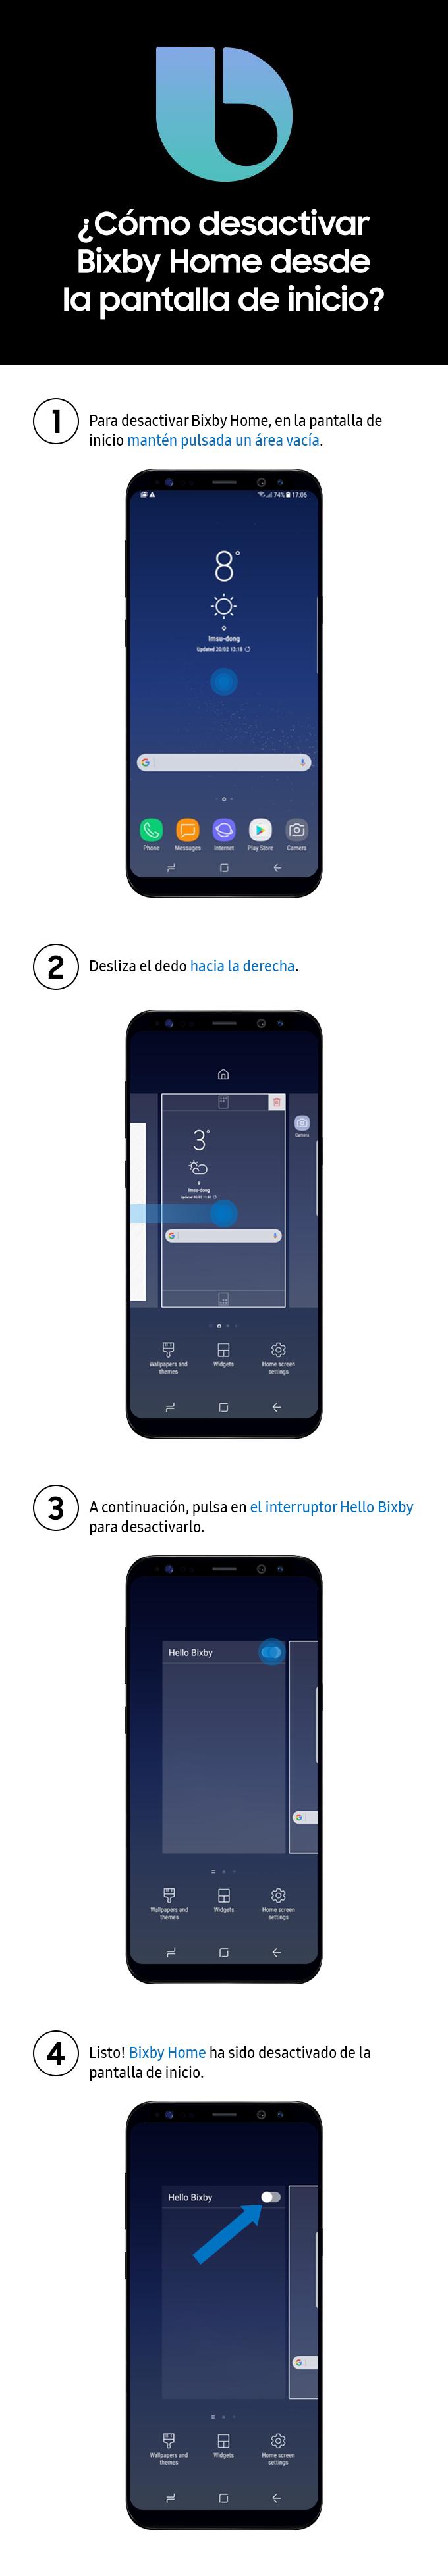 Como desactivar Bixby Home desde la pantalla de inicio